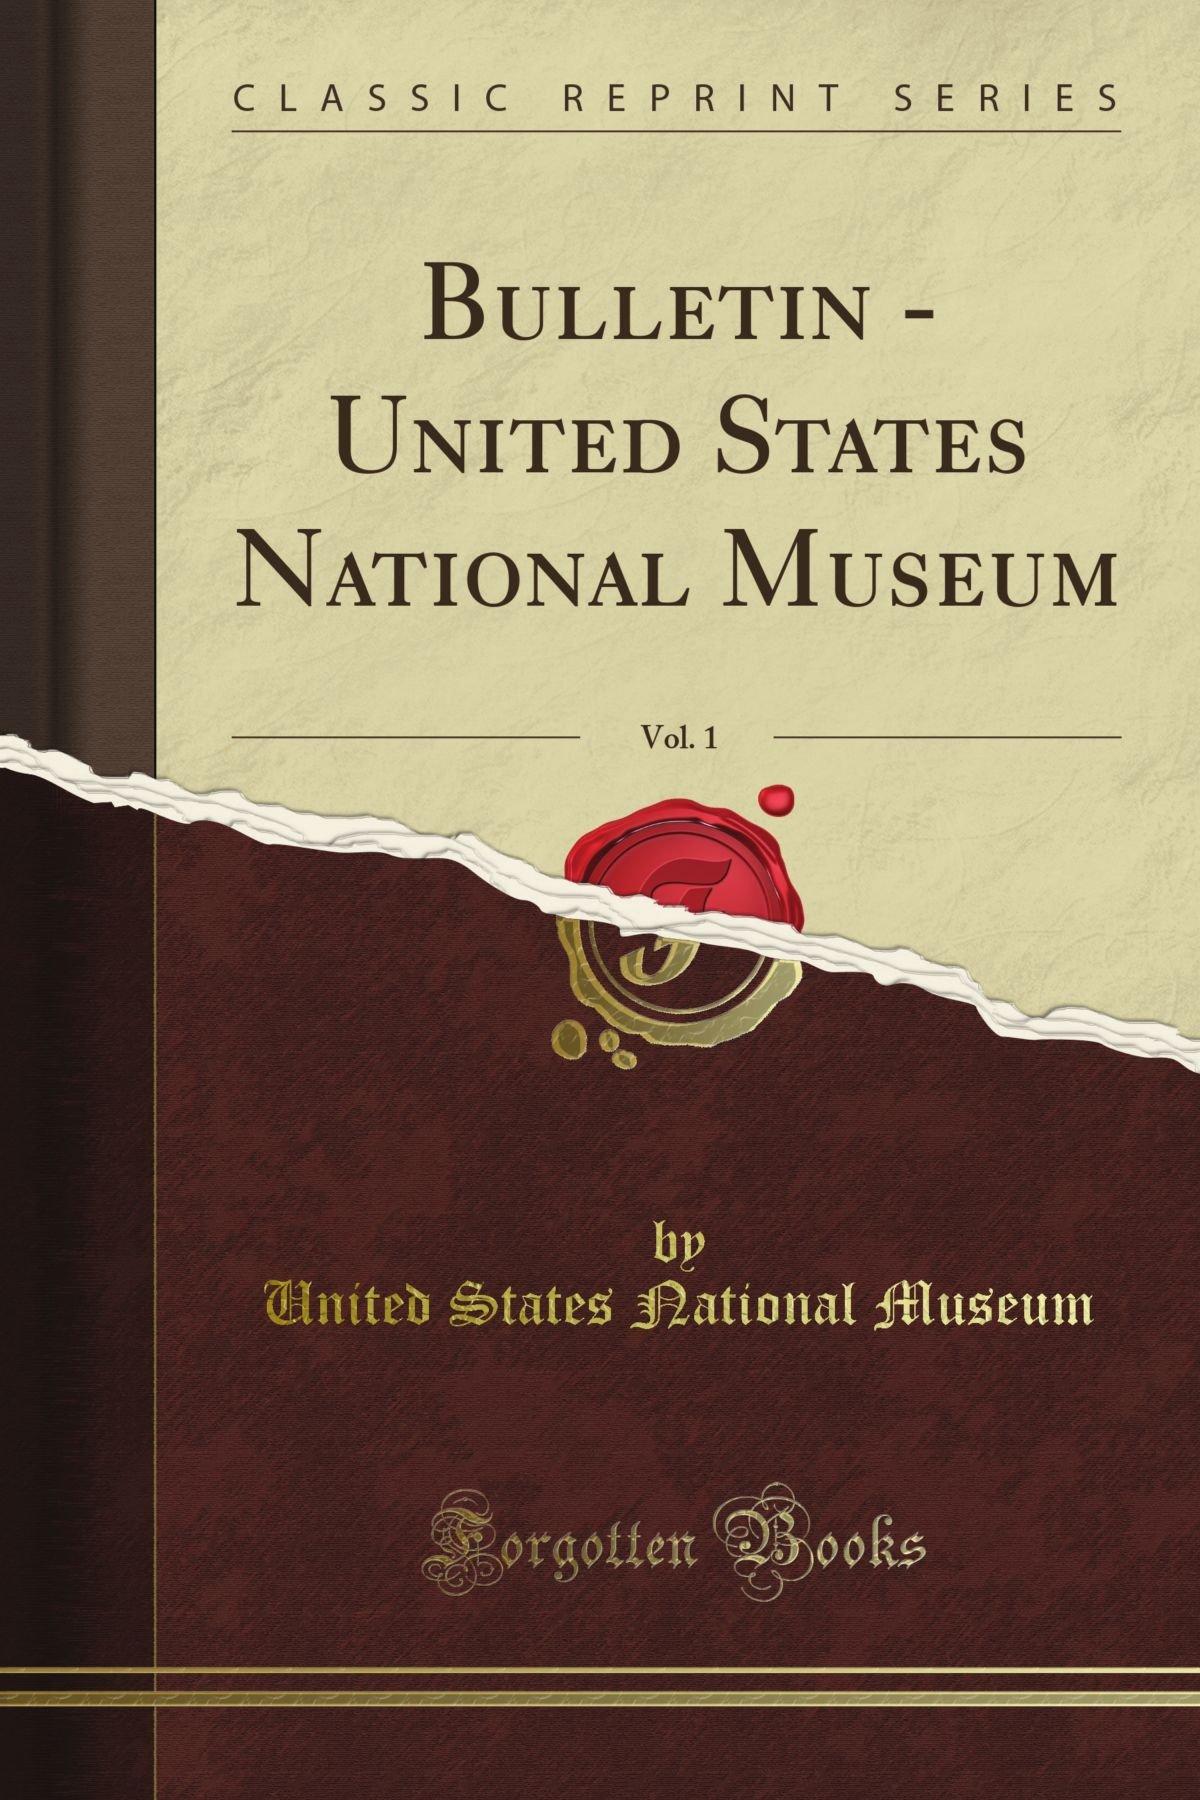 Bulletin - United States National Museum, Vol. 1 (Classic Reprint) ebook